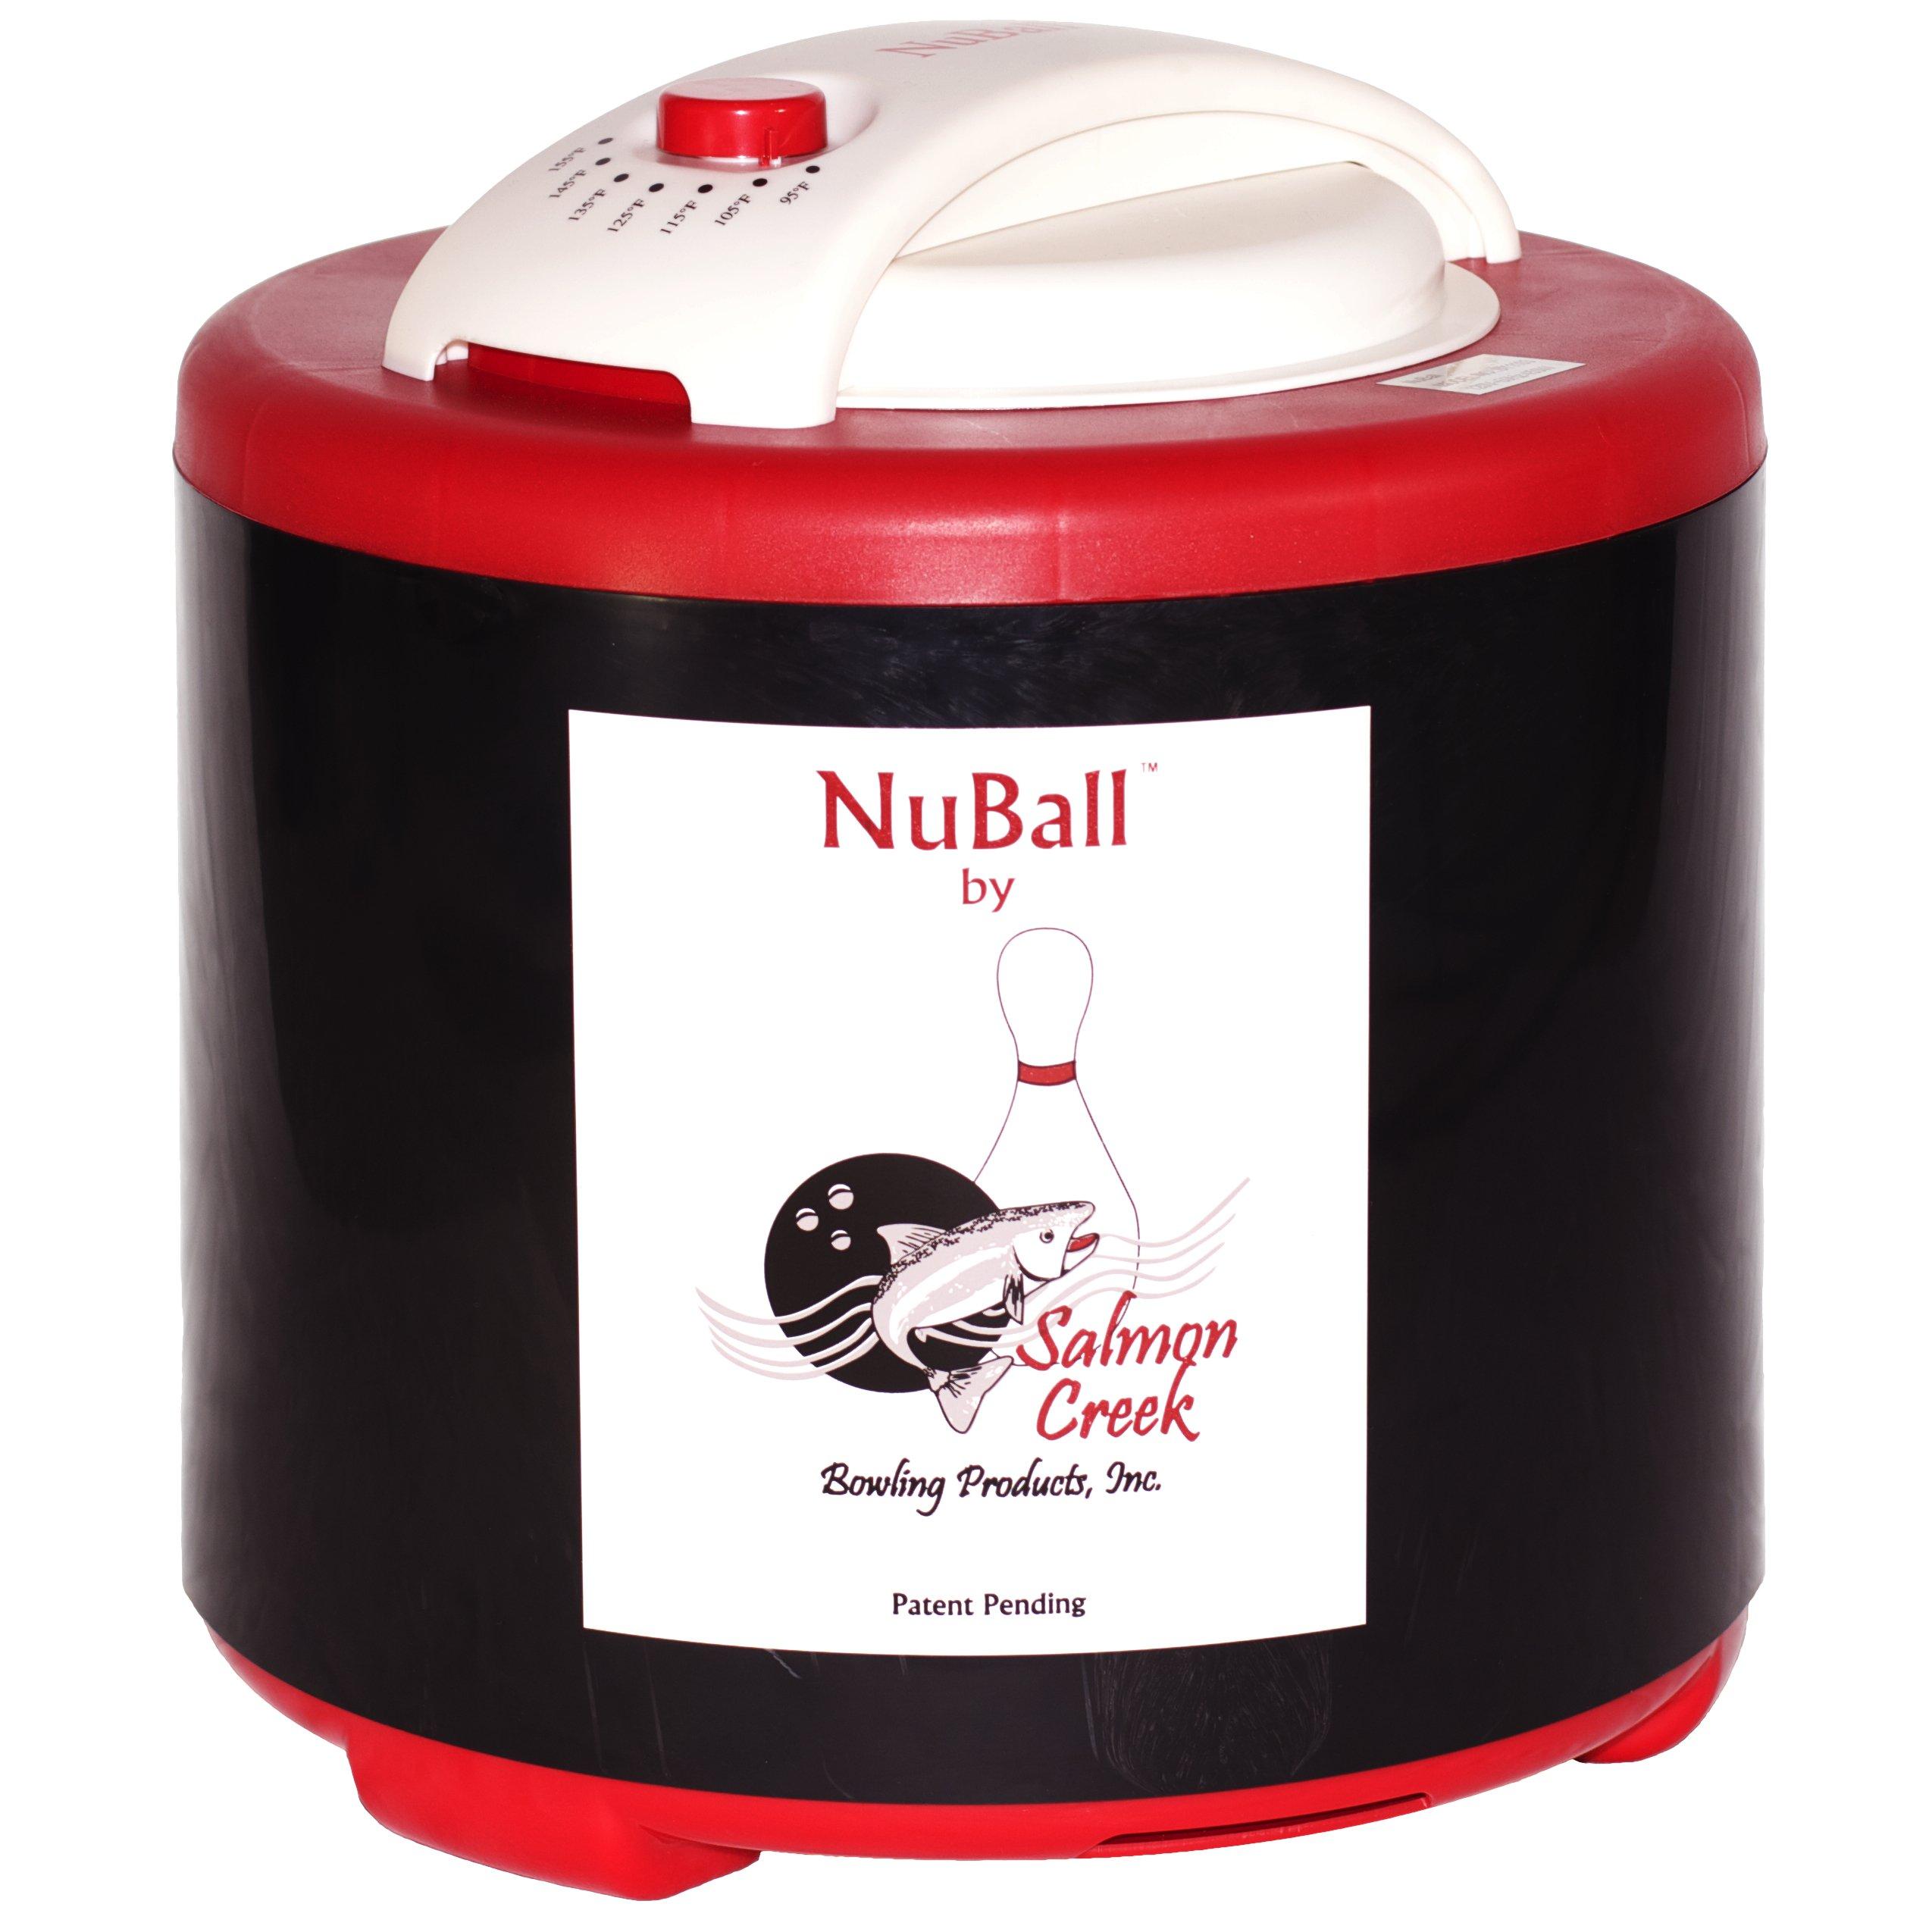 NuBall Bowling Ball Rejuvenator by Salmon Creek